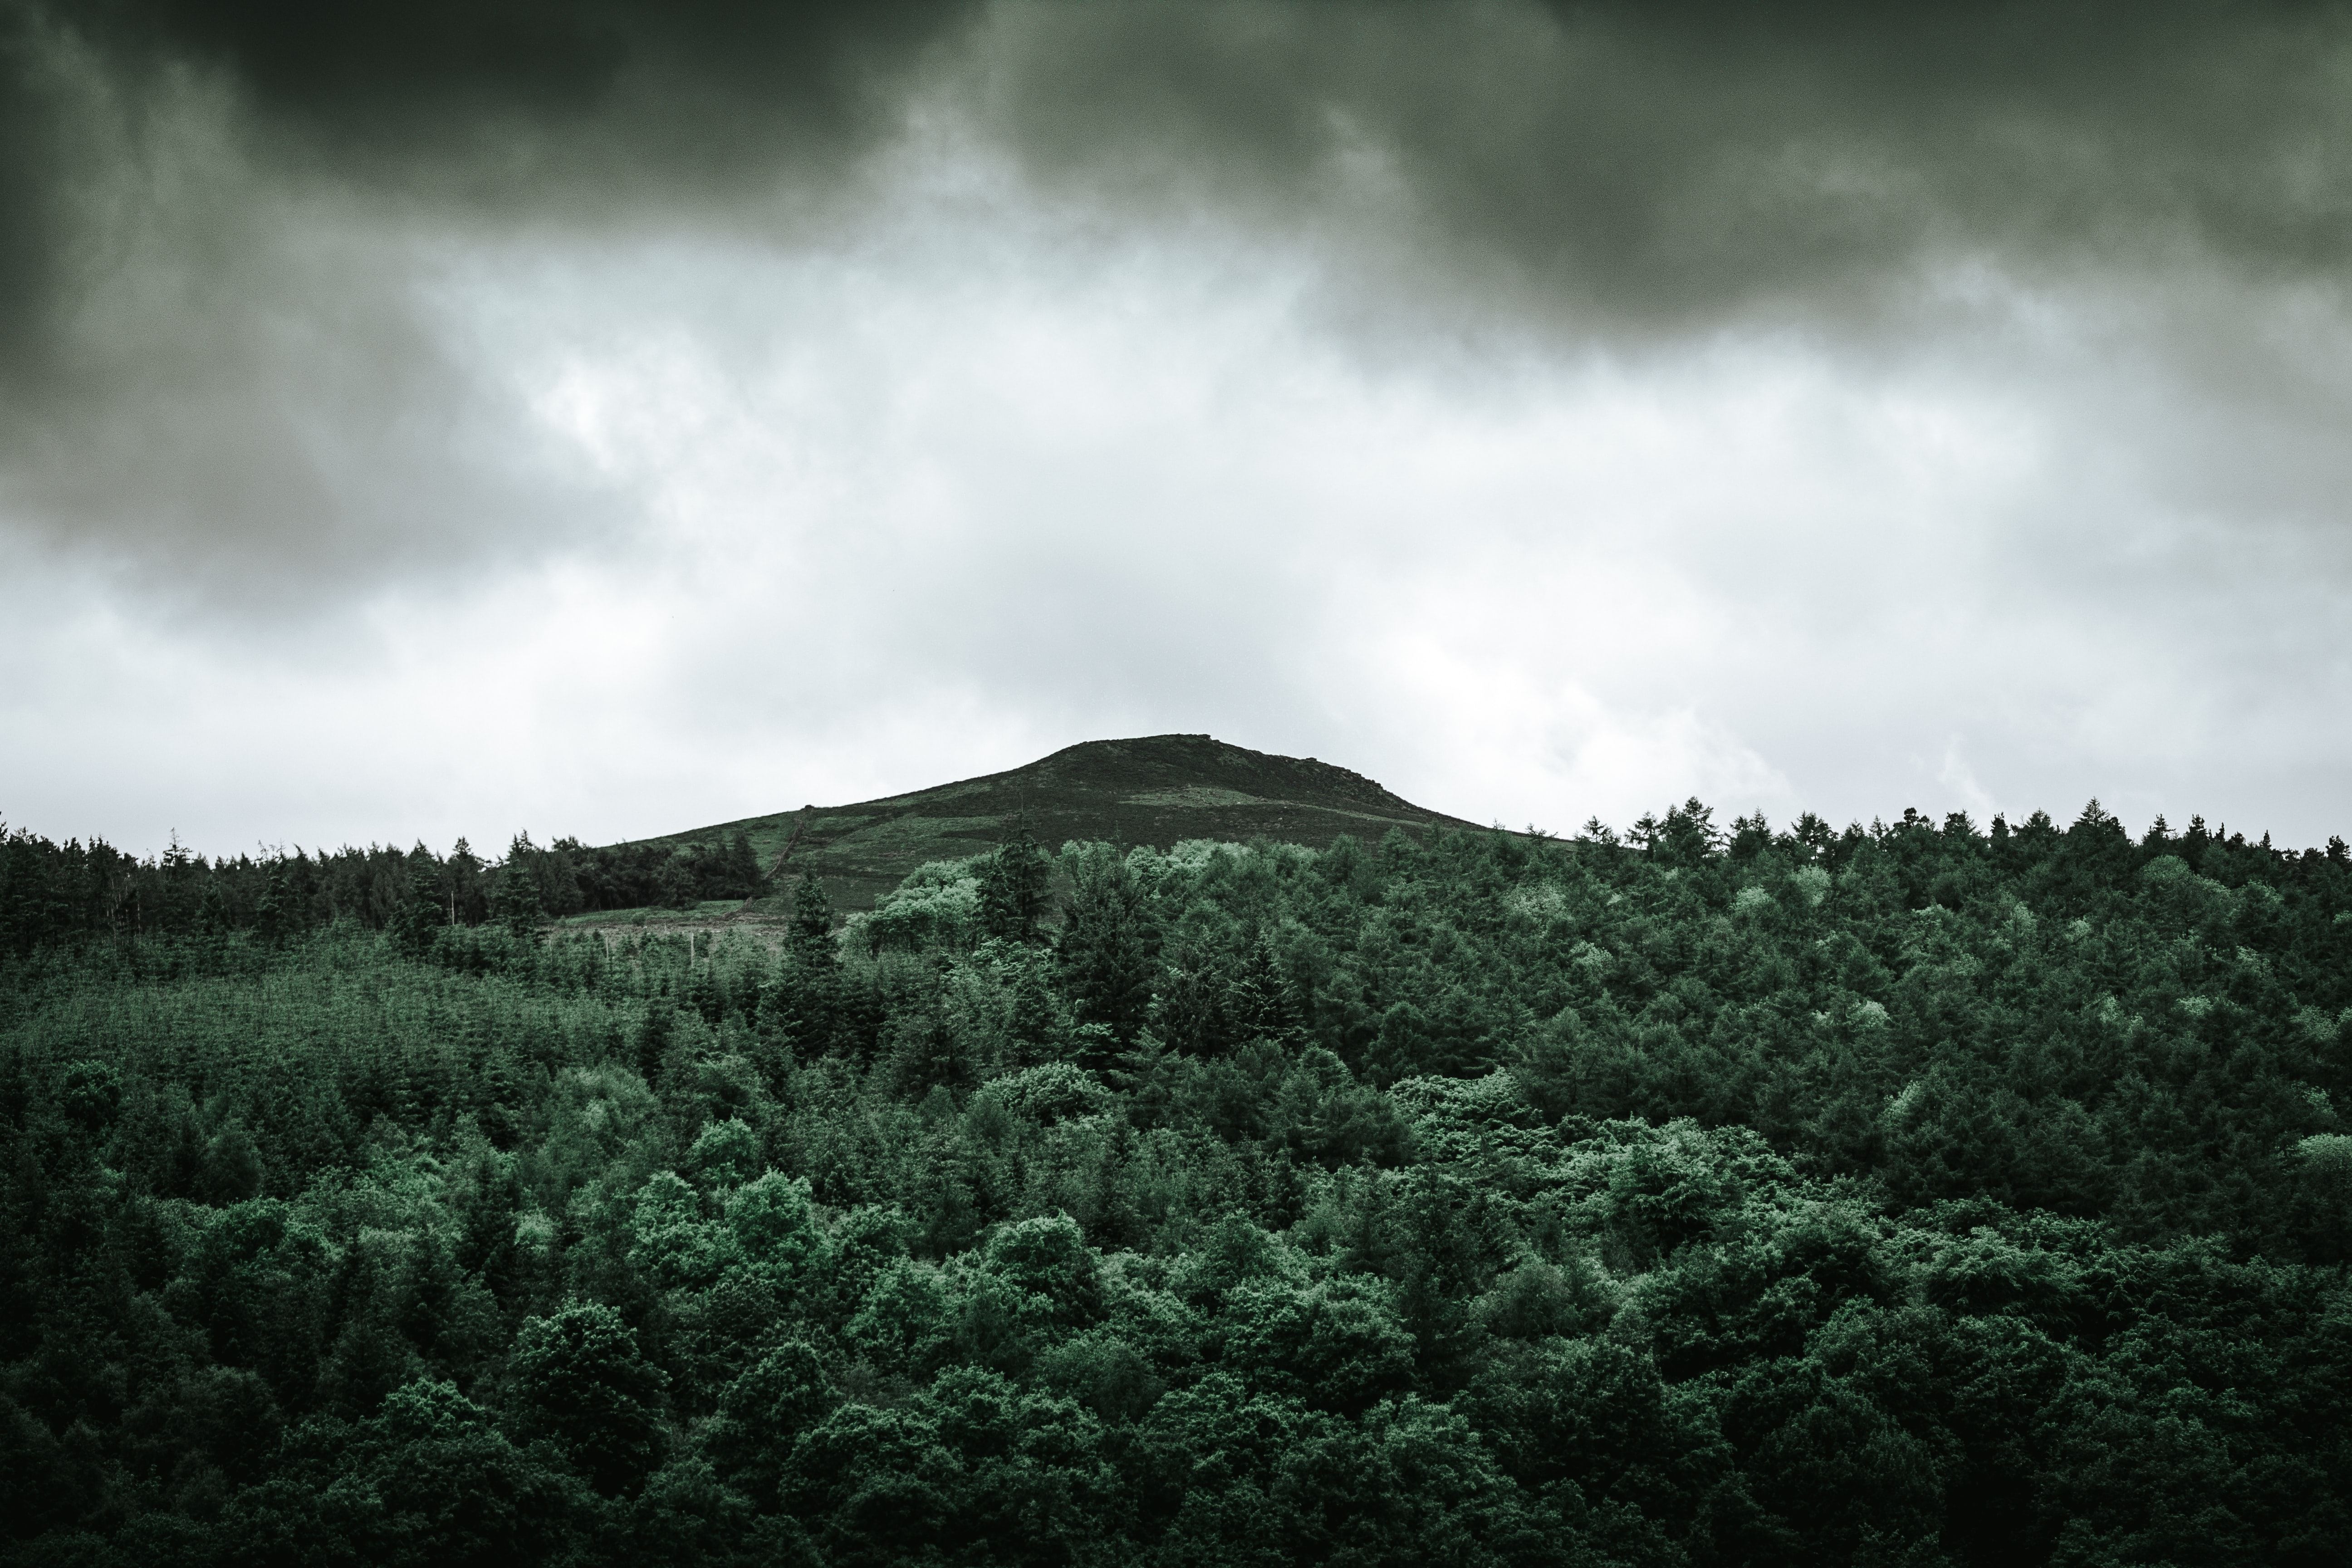 A green hill rising up above a coniferous forest near Ladybower Reservoir